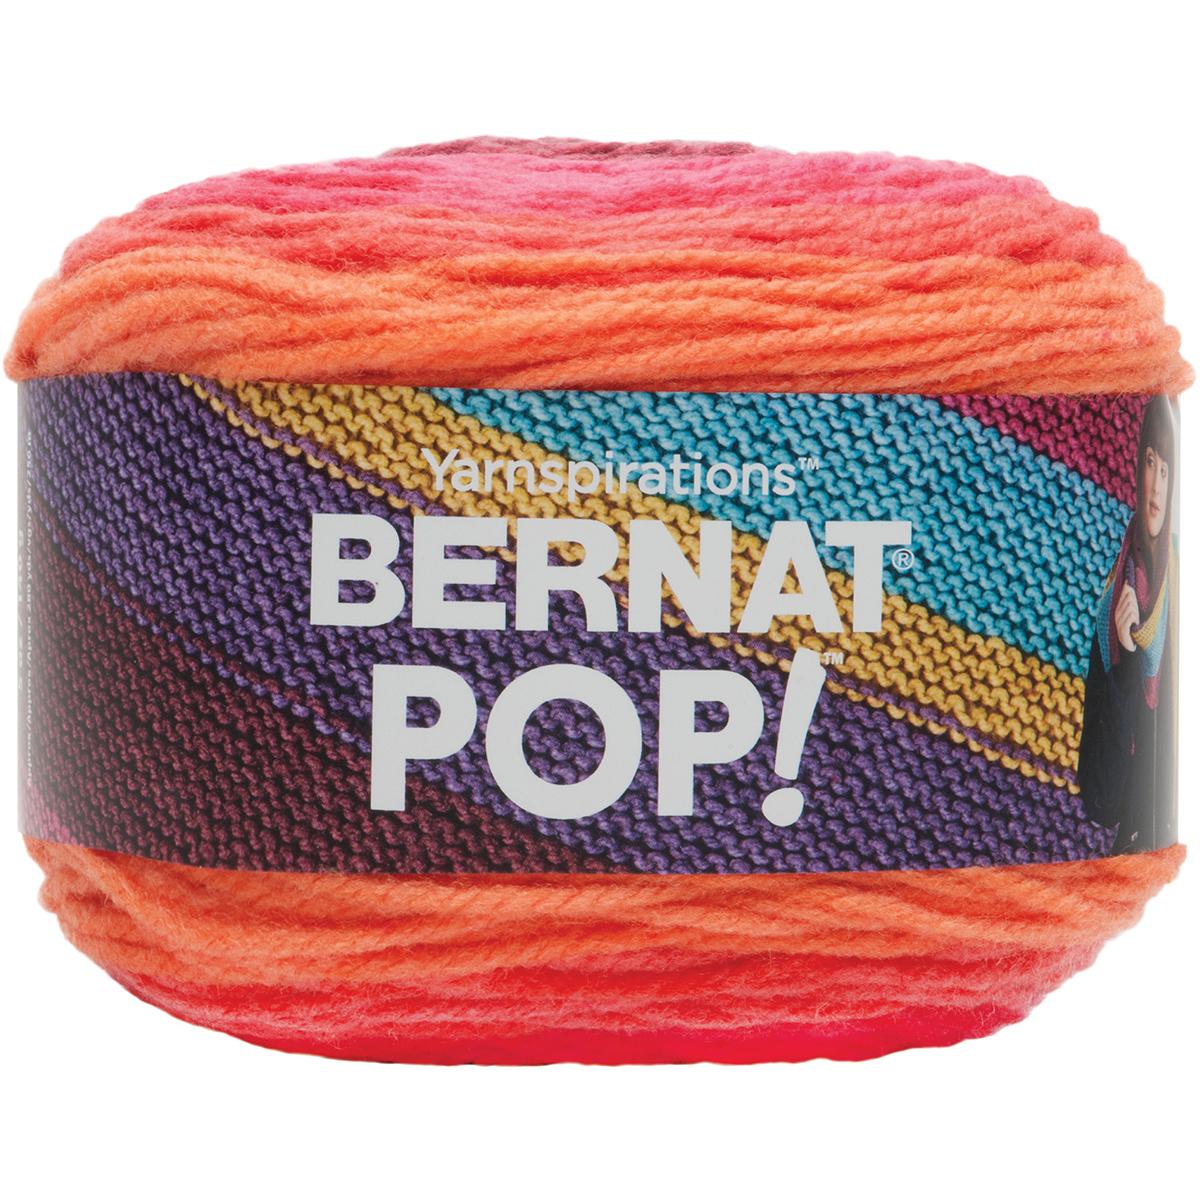 Bernat Pop! Yarn, 140g, Hot Chocolate